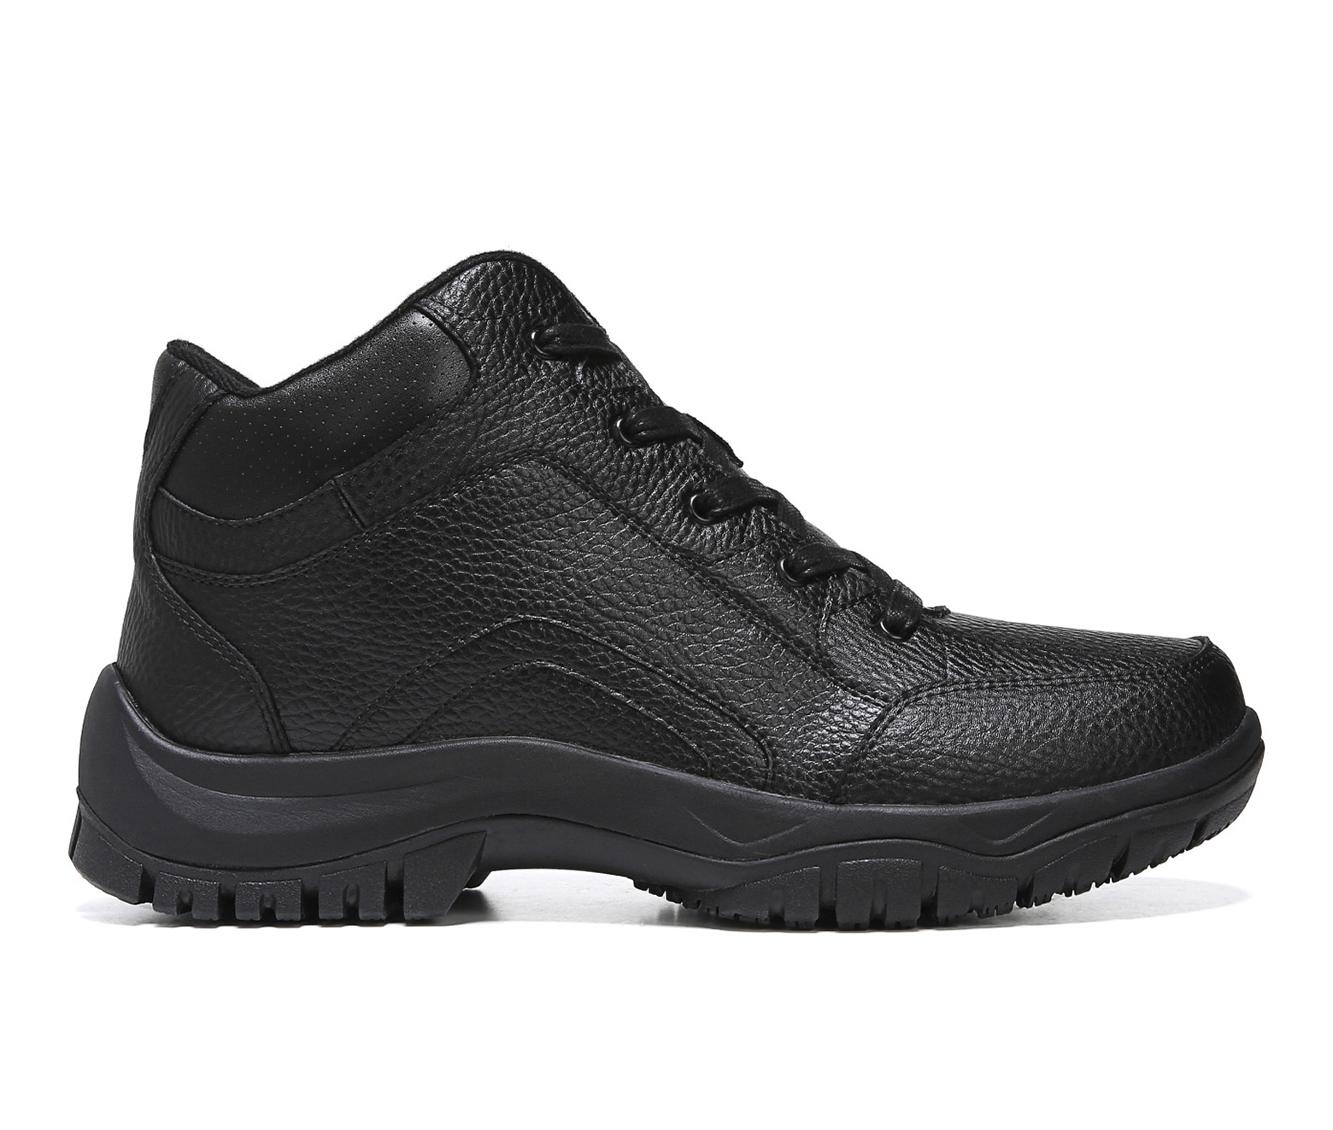 Dr. Scholls Charge Men's Boots (Black Leather)